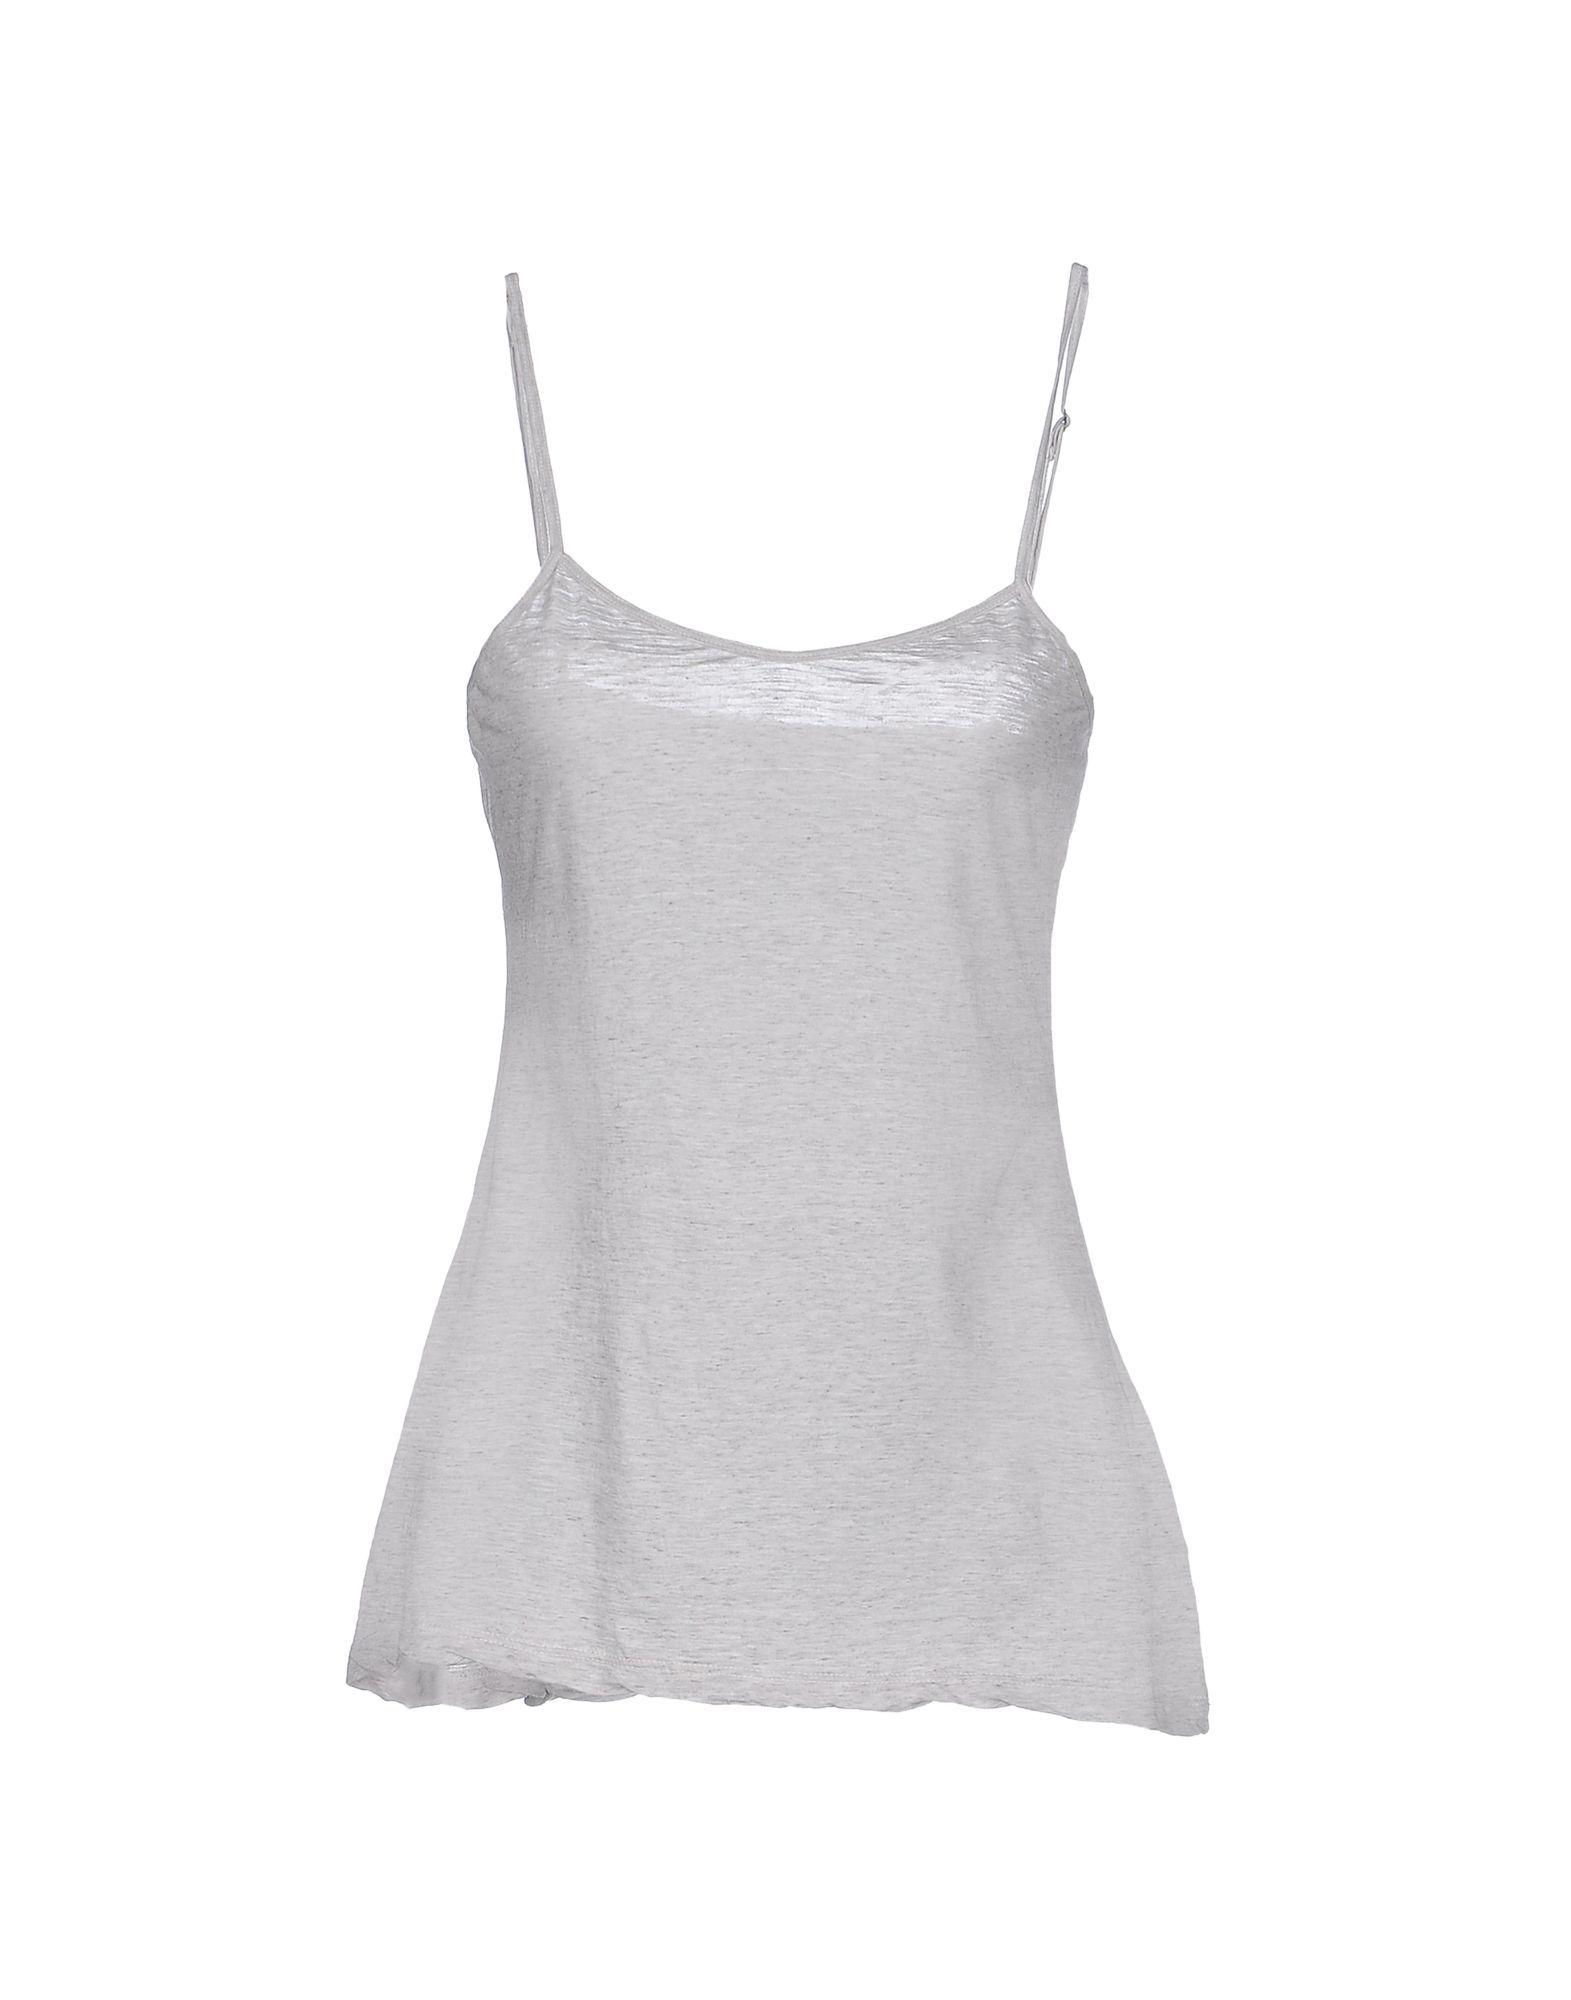 James Perse Light Grey Cotton Camisole